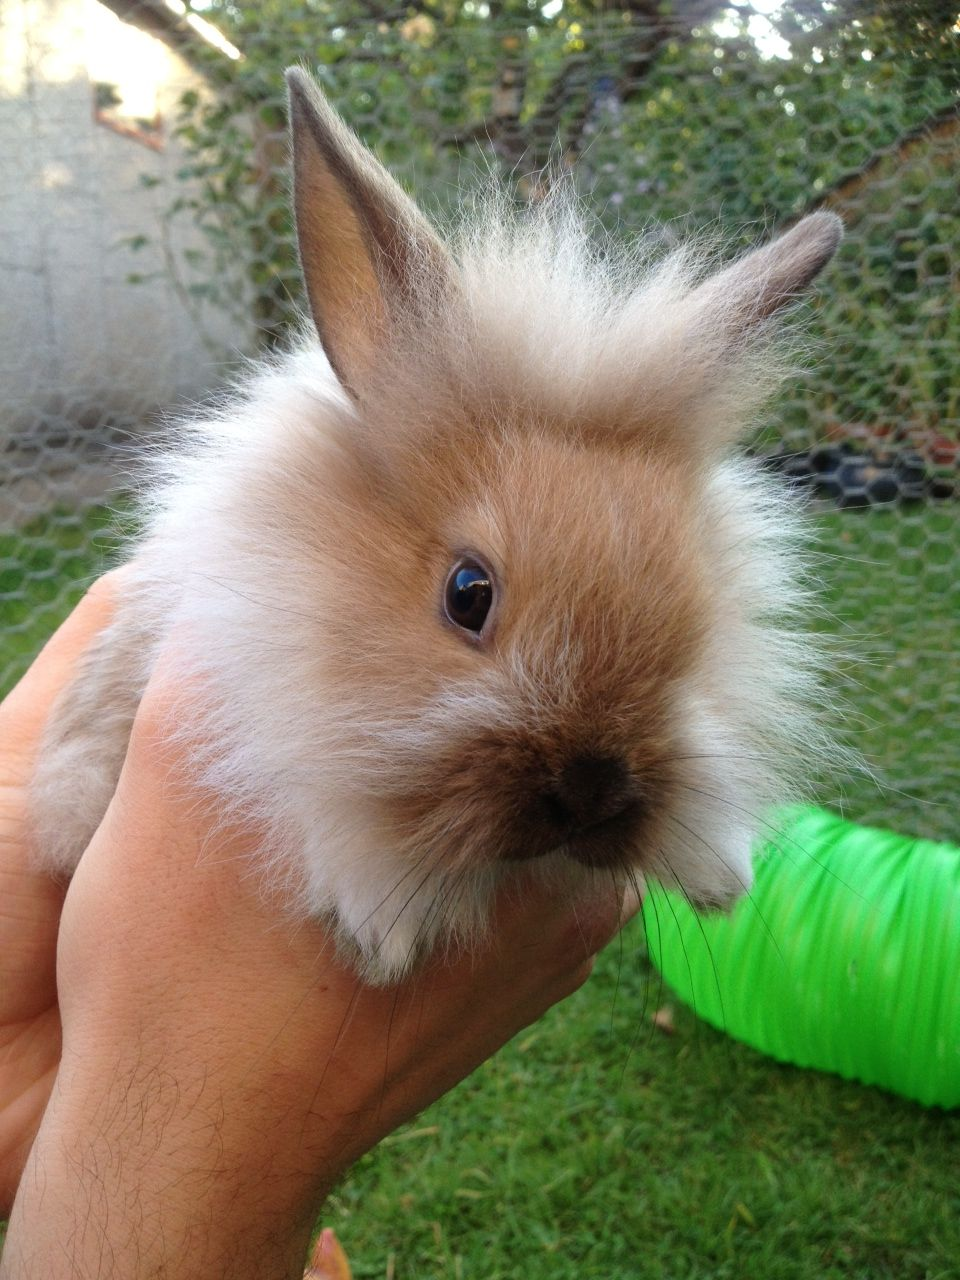 Image of: Kitten Baby Lionhead Rabbit Pinterest Baby Lionhead Rabbit Rabbits Pinterest Bunny Rabbit And